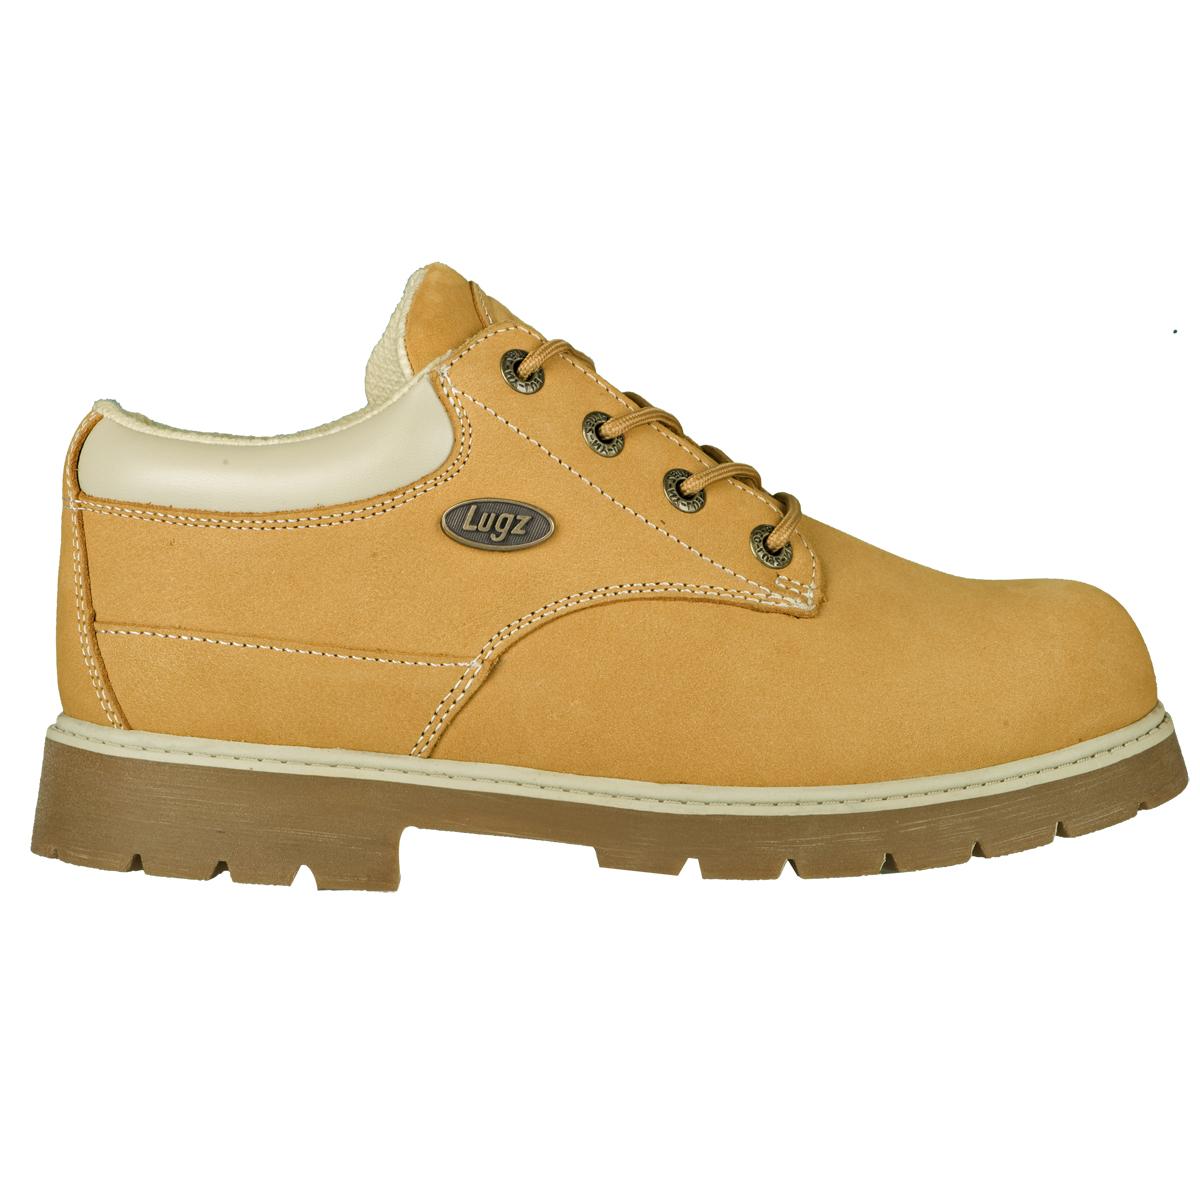 Lugz Drifter Lo Eee Mens Boot Wheat/cream/gum | Gigajam